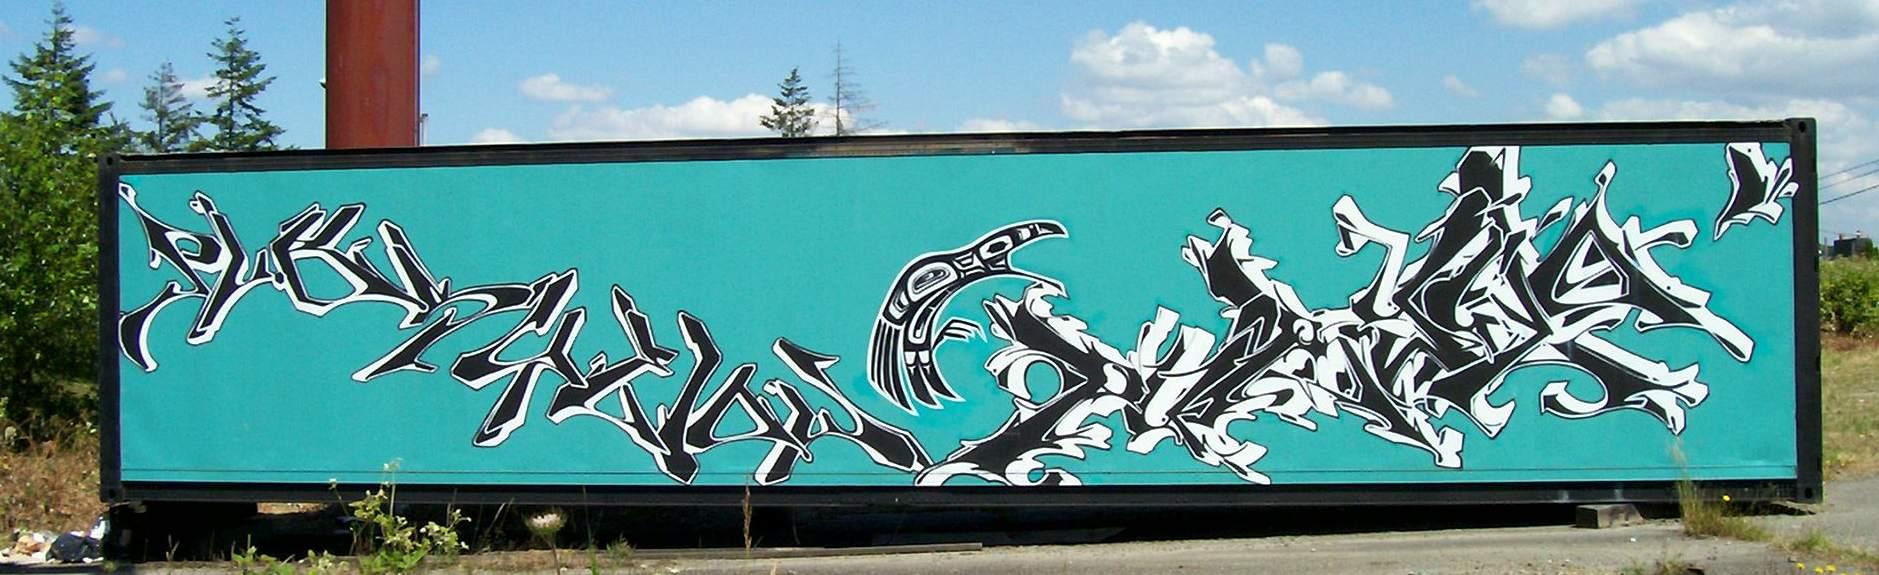 Graffiti wall tacoma - In Tacoma